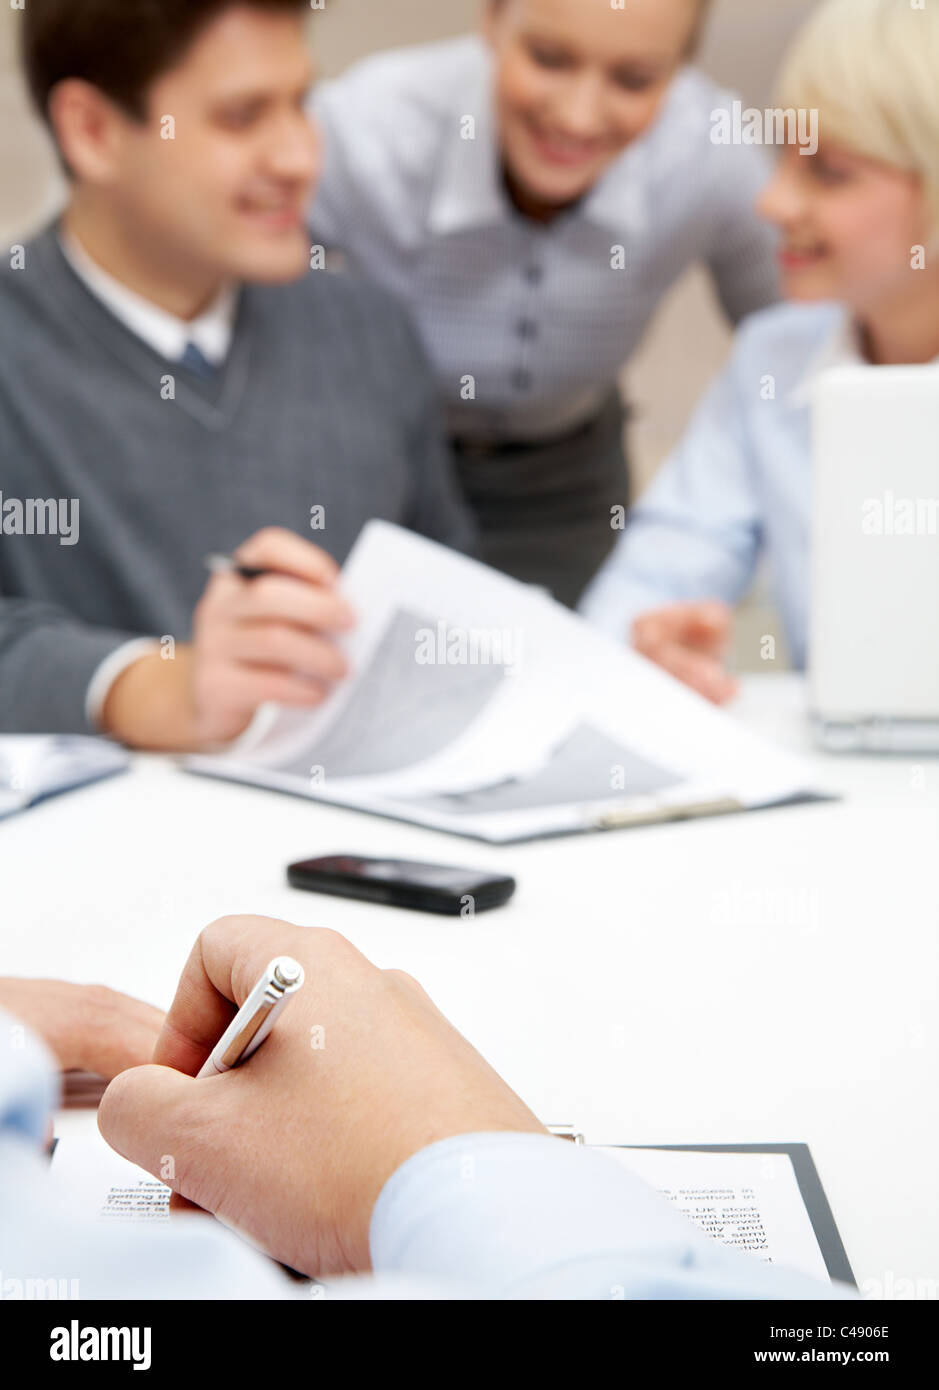 Photo of human hands making notes on background of man explaining idea to employees - Stock Image